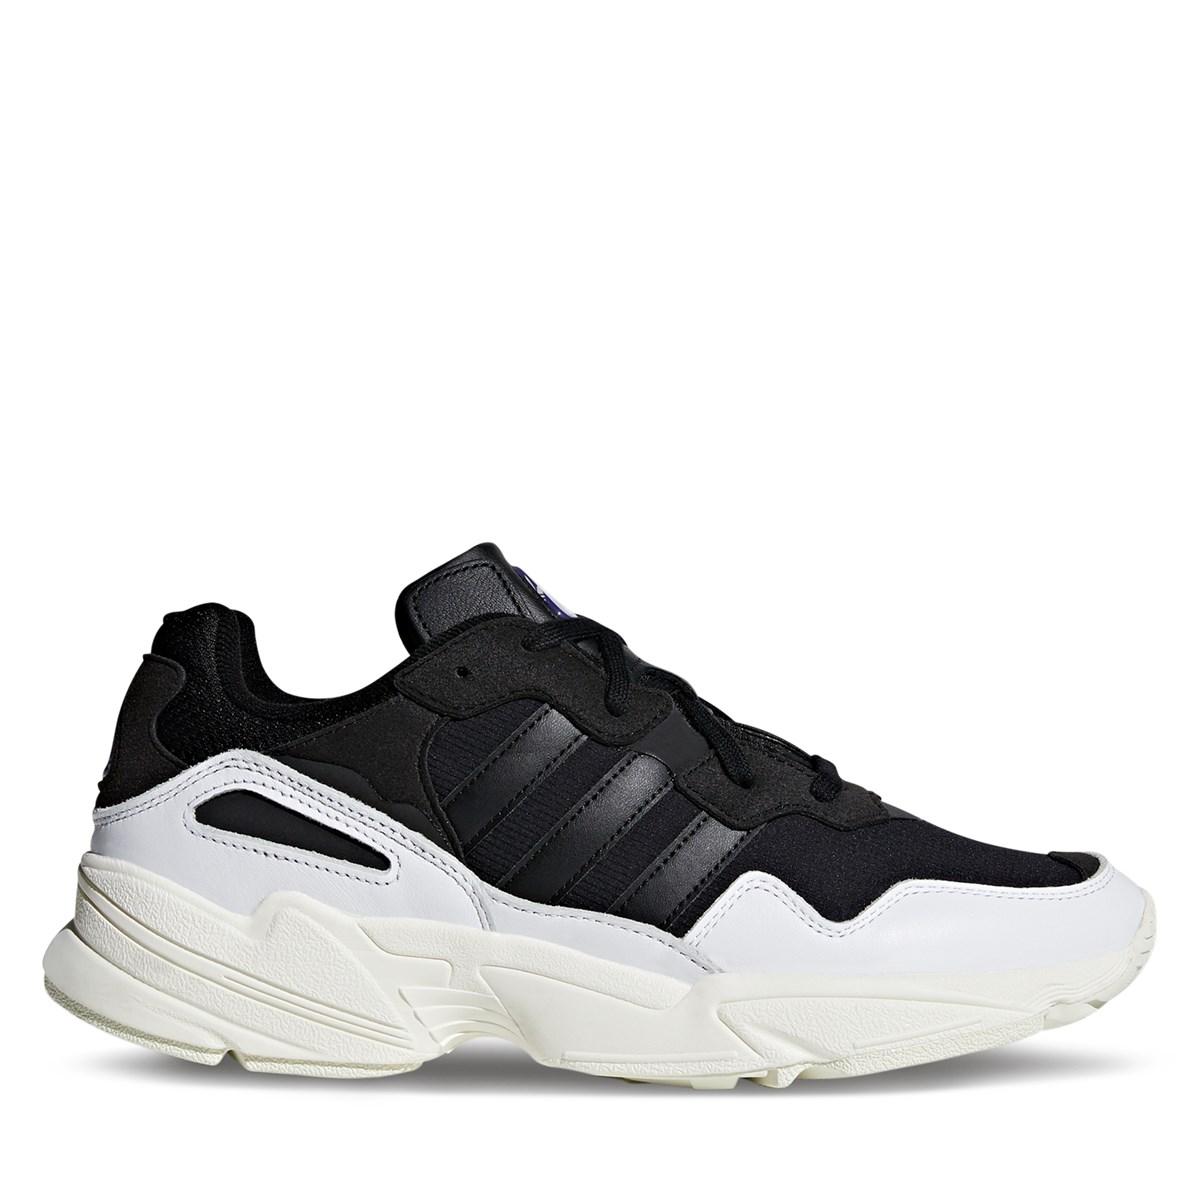 Men's Yung-96 Sneaker's in Black